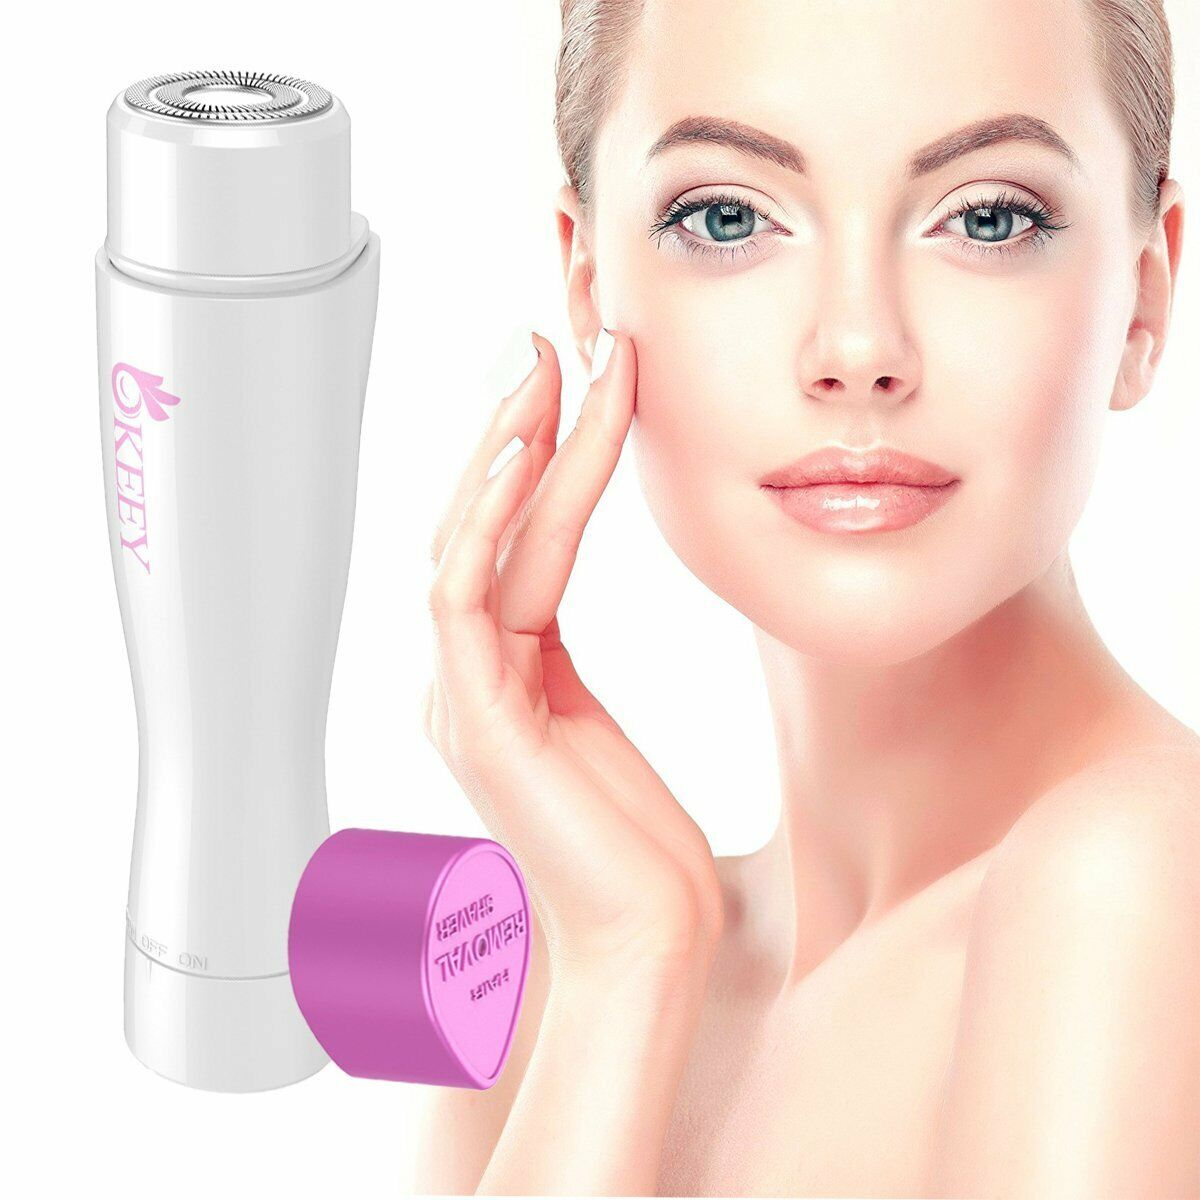 Damen Gesichts Haarentfernung elektrisch schmerzlose Epilierer Damenbart Haare